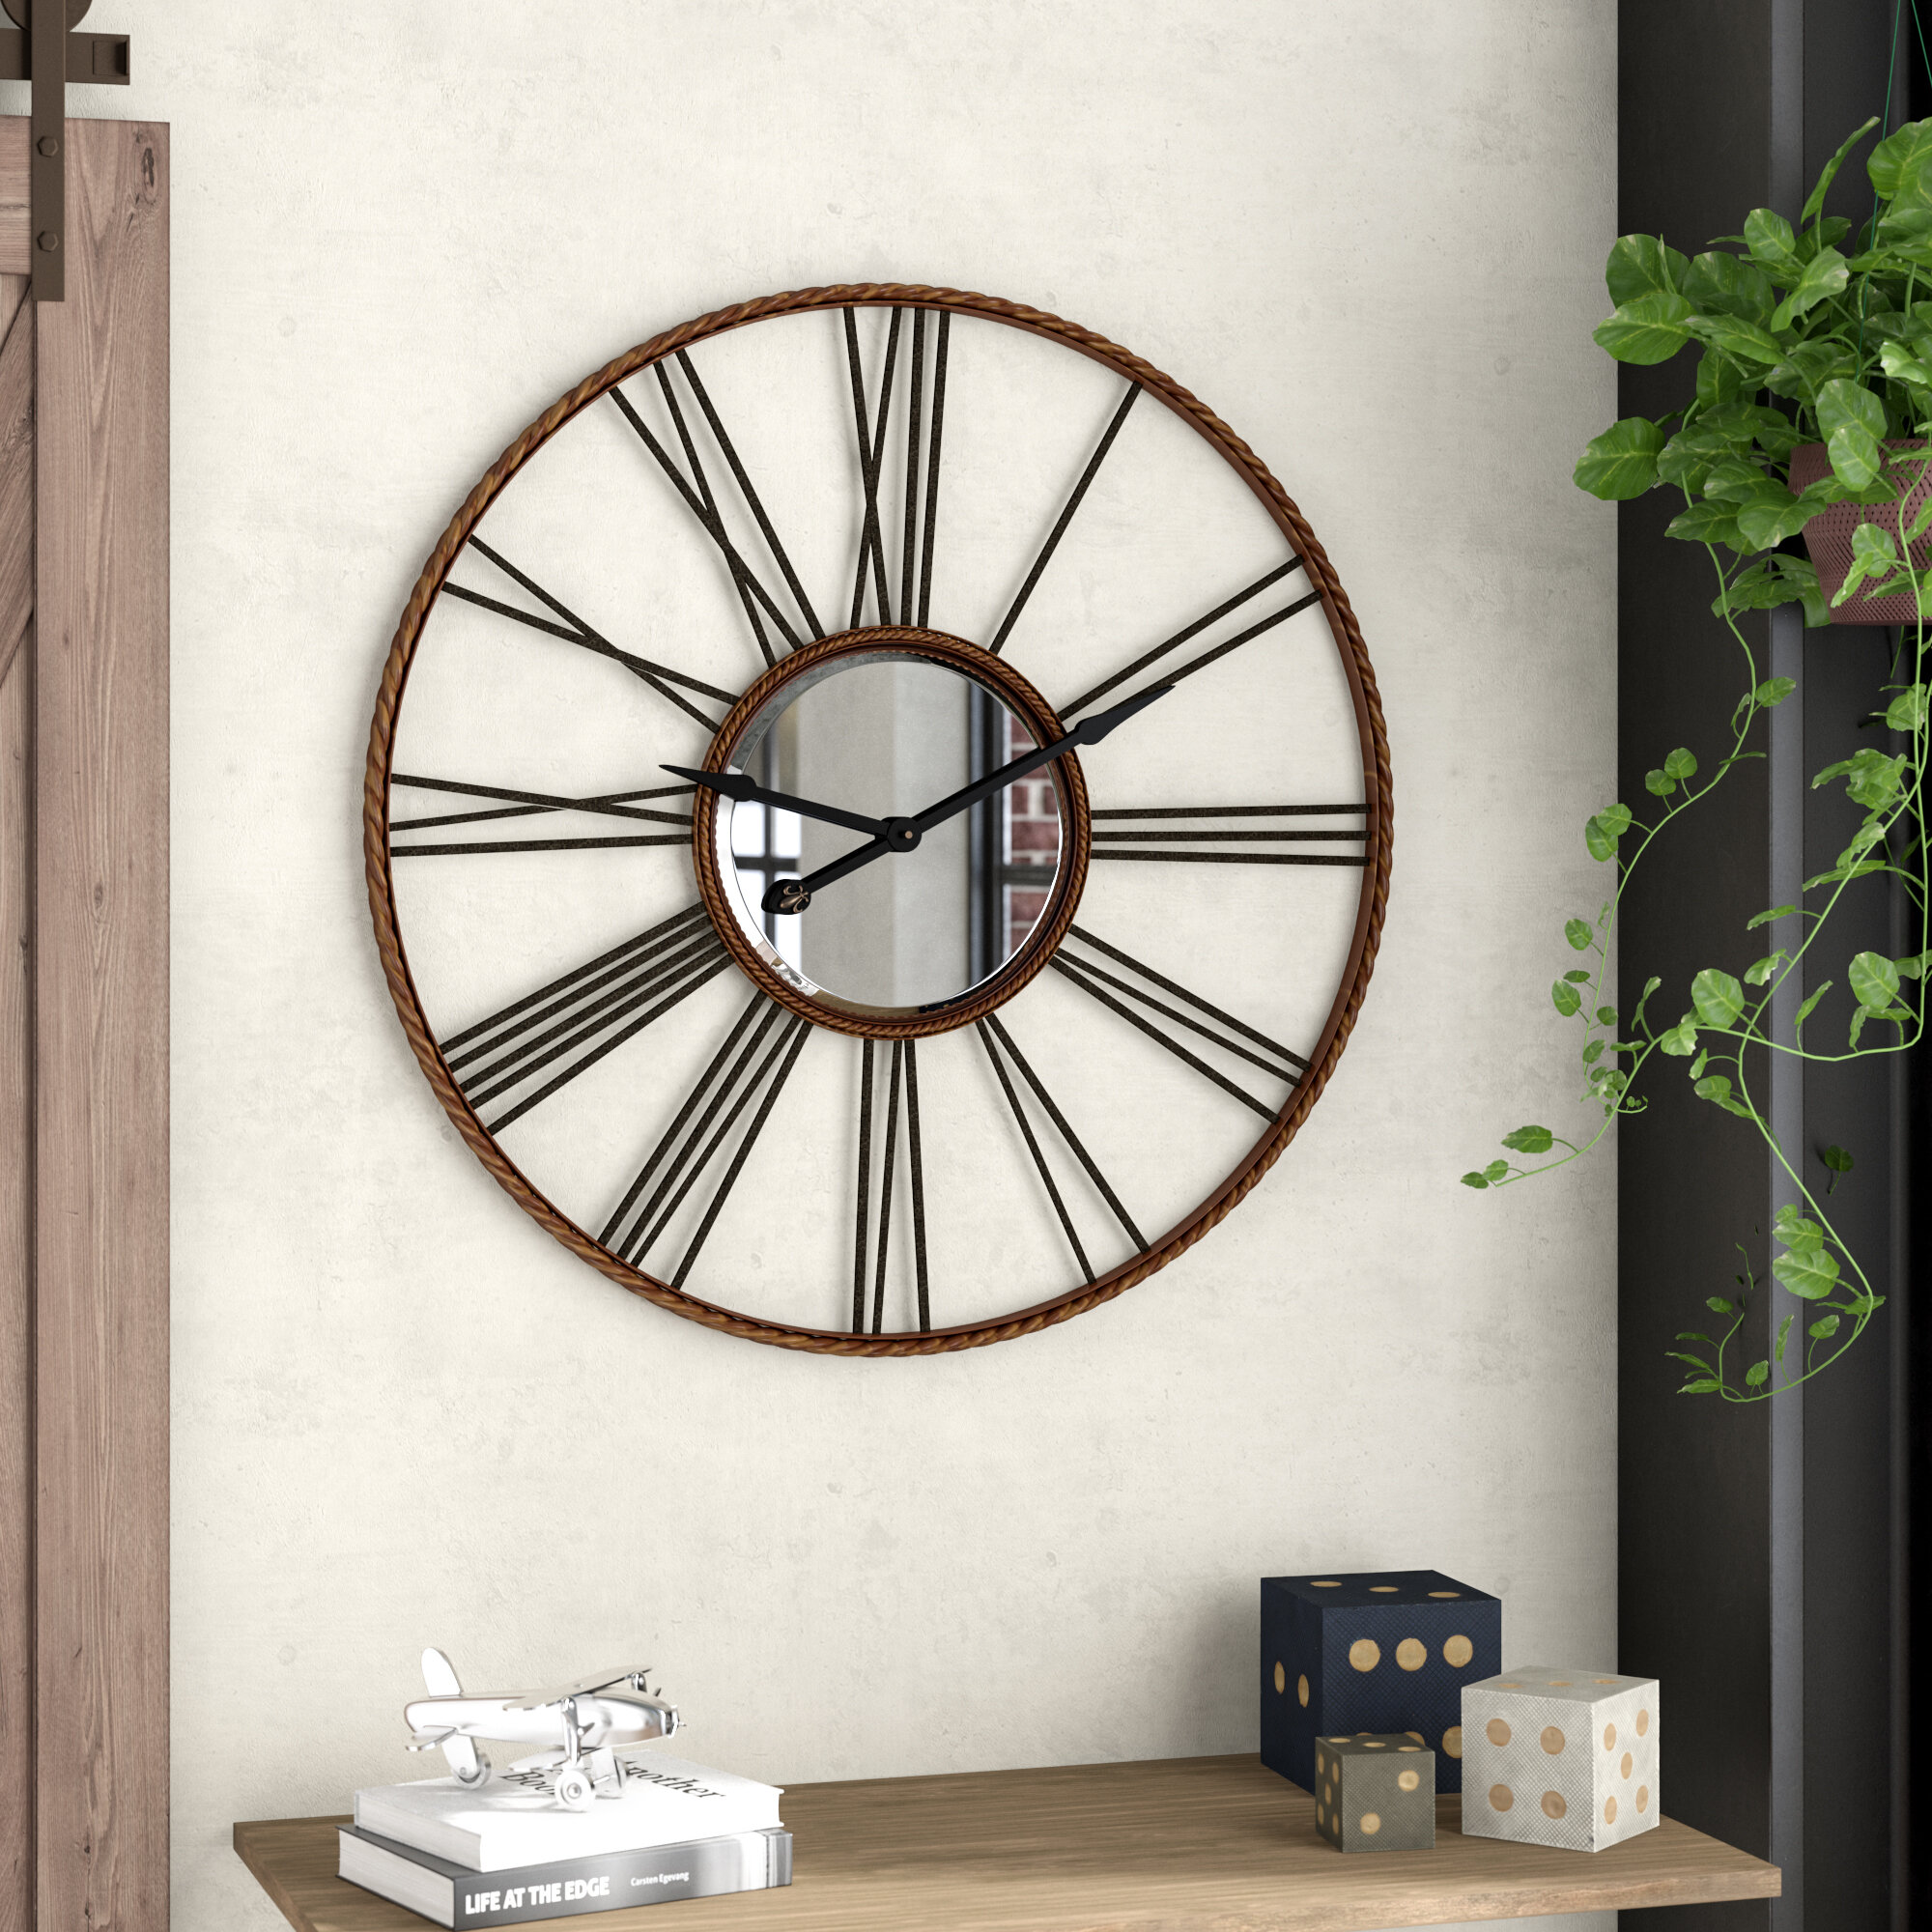 Trent austin design lonon 42 rocca oversized wall clock reviews wayfair ca